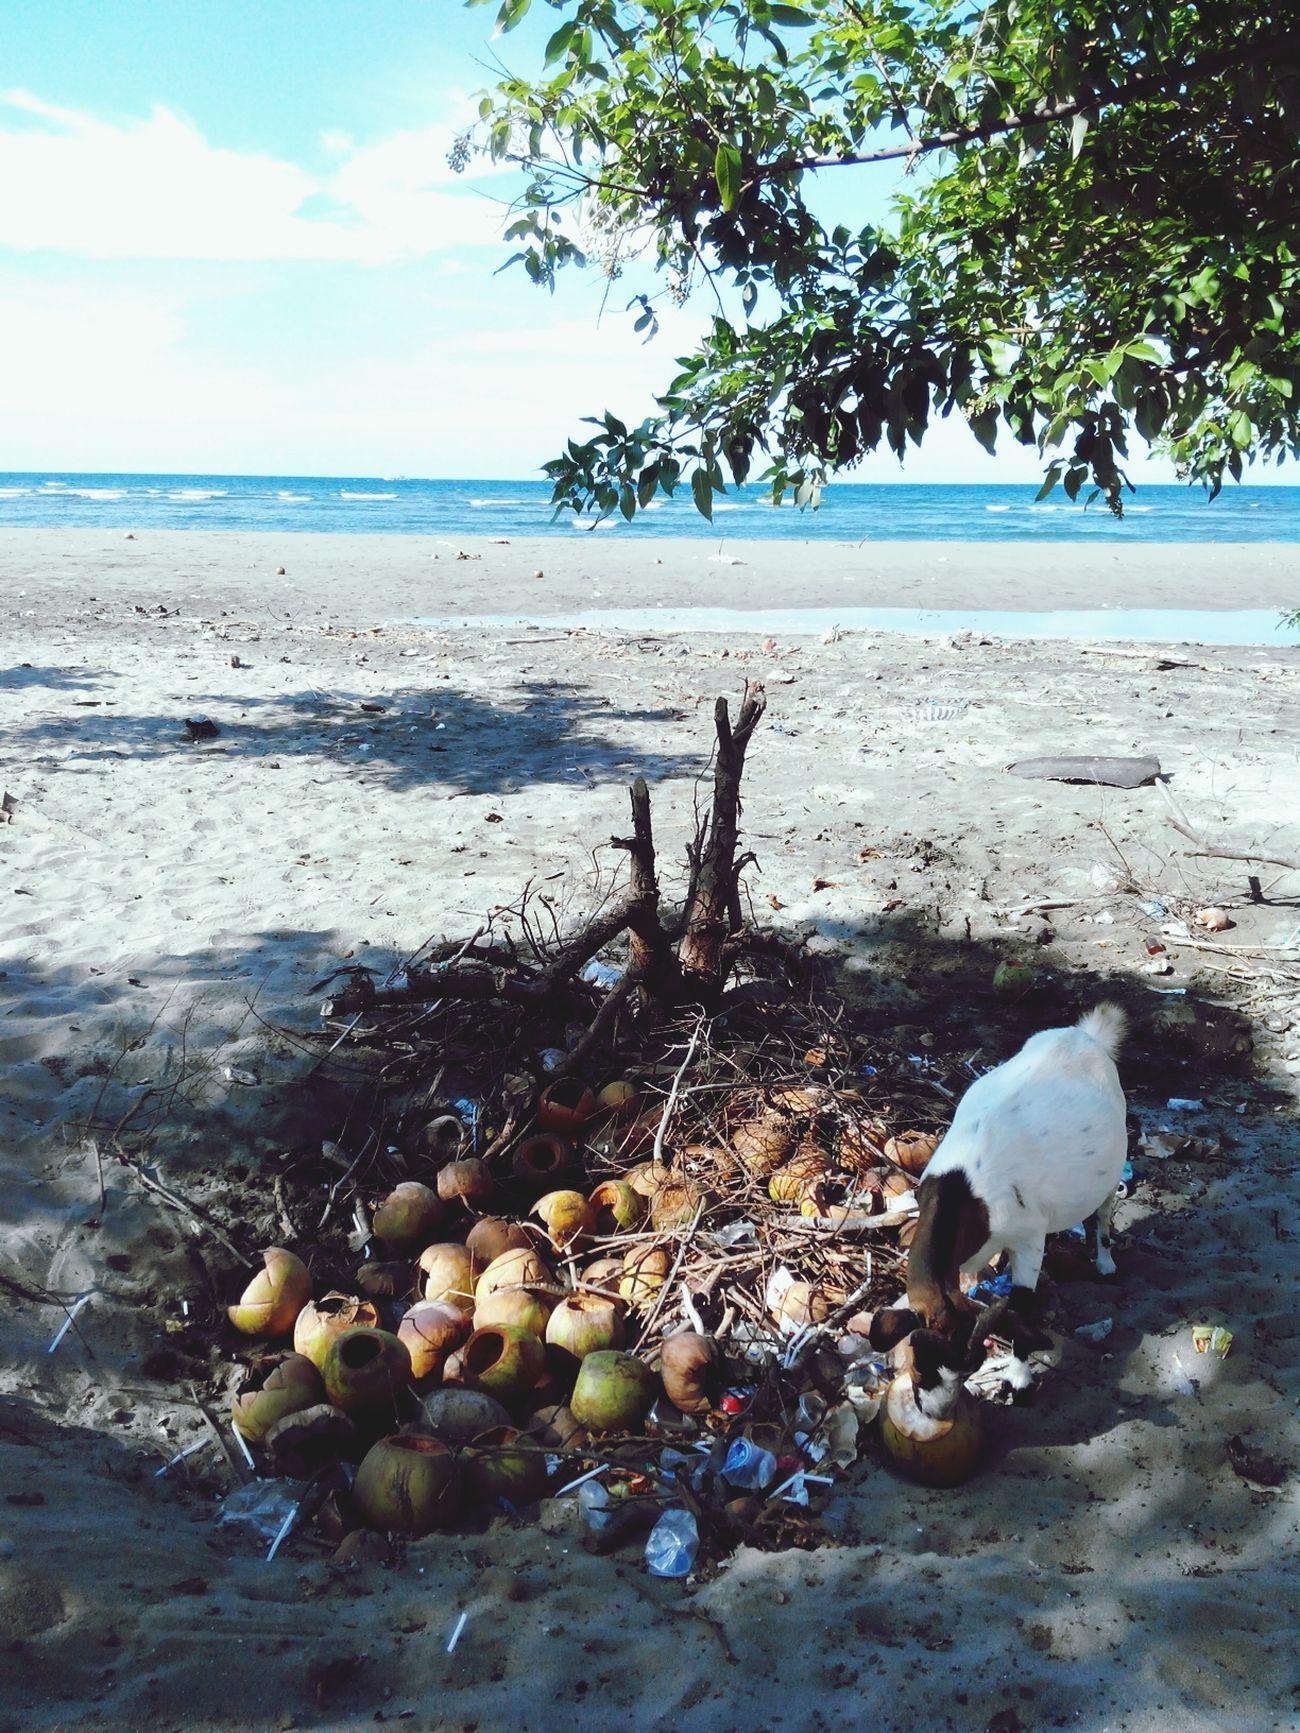 Numpang jualan di pantai punya Tuhan terus buang sampah sembarangan. Ga paham aku sama orang kita Beach Life Aceh